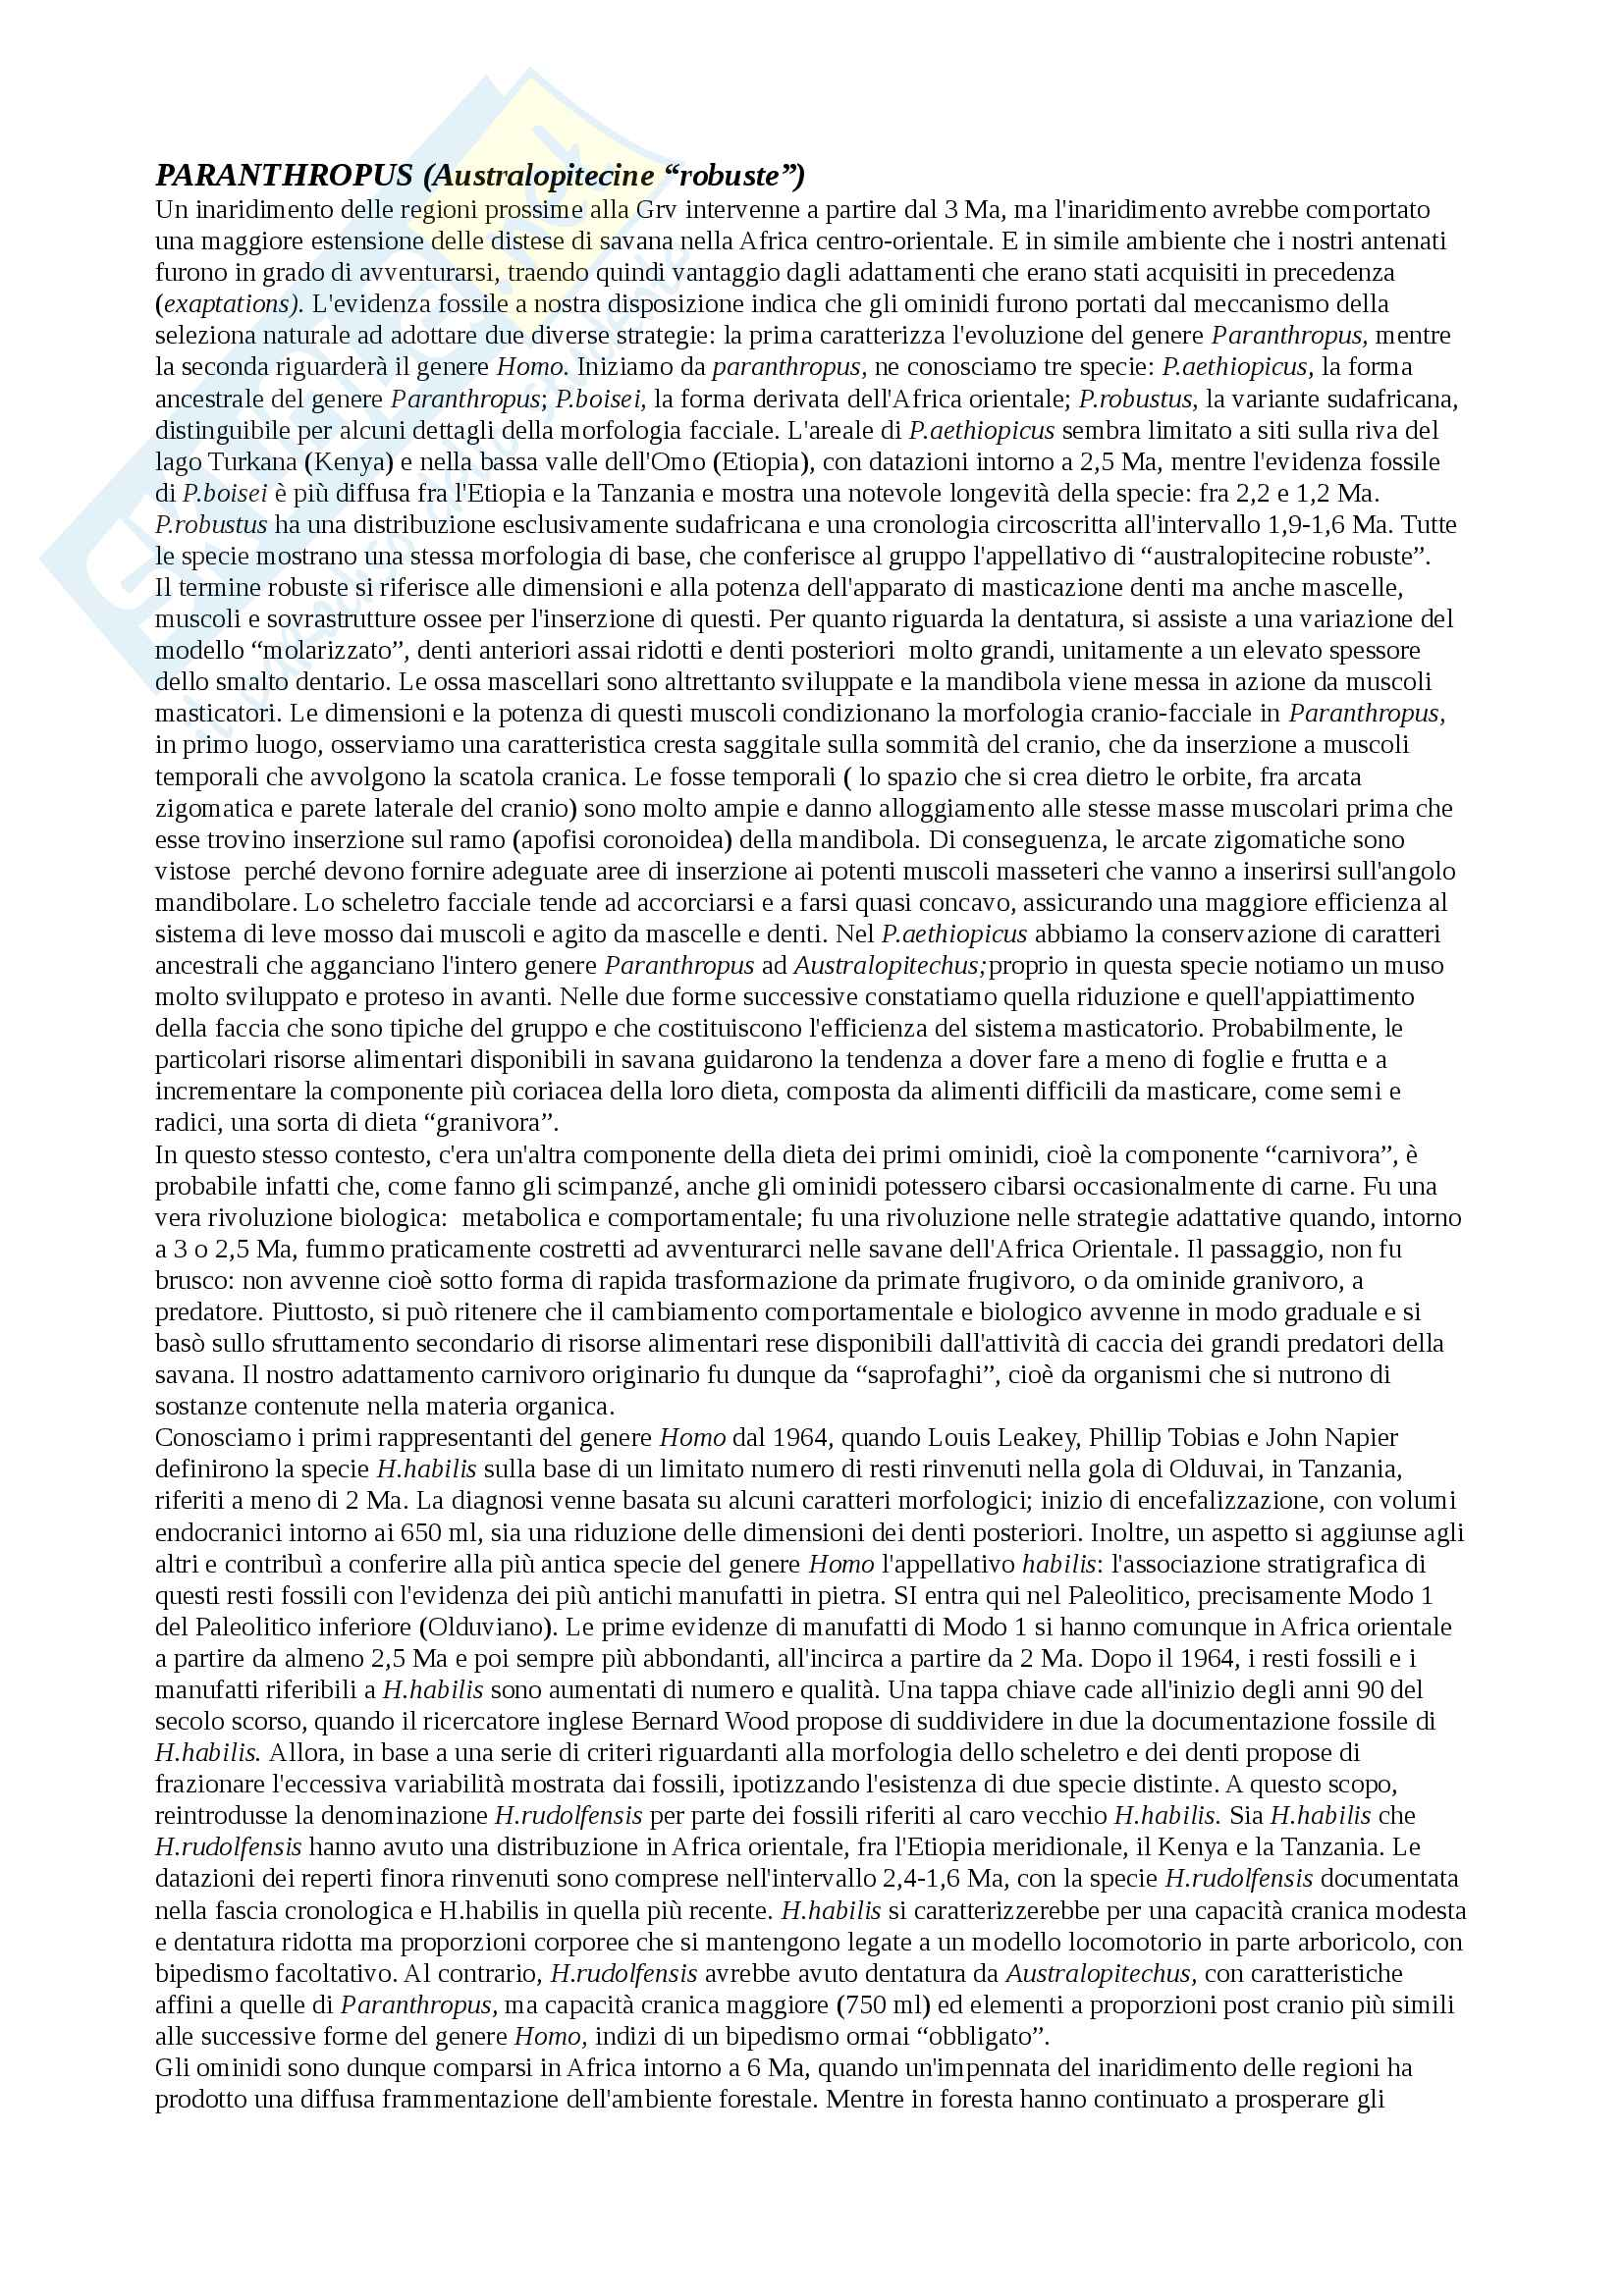 Paleantropologia Parantropitecine e genere Homo